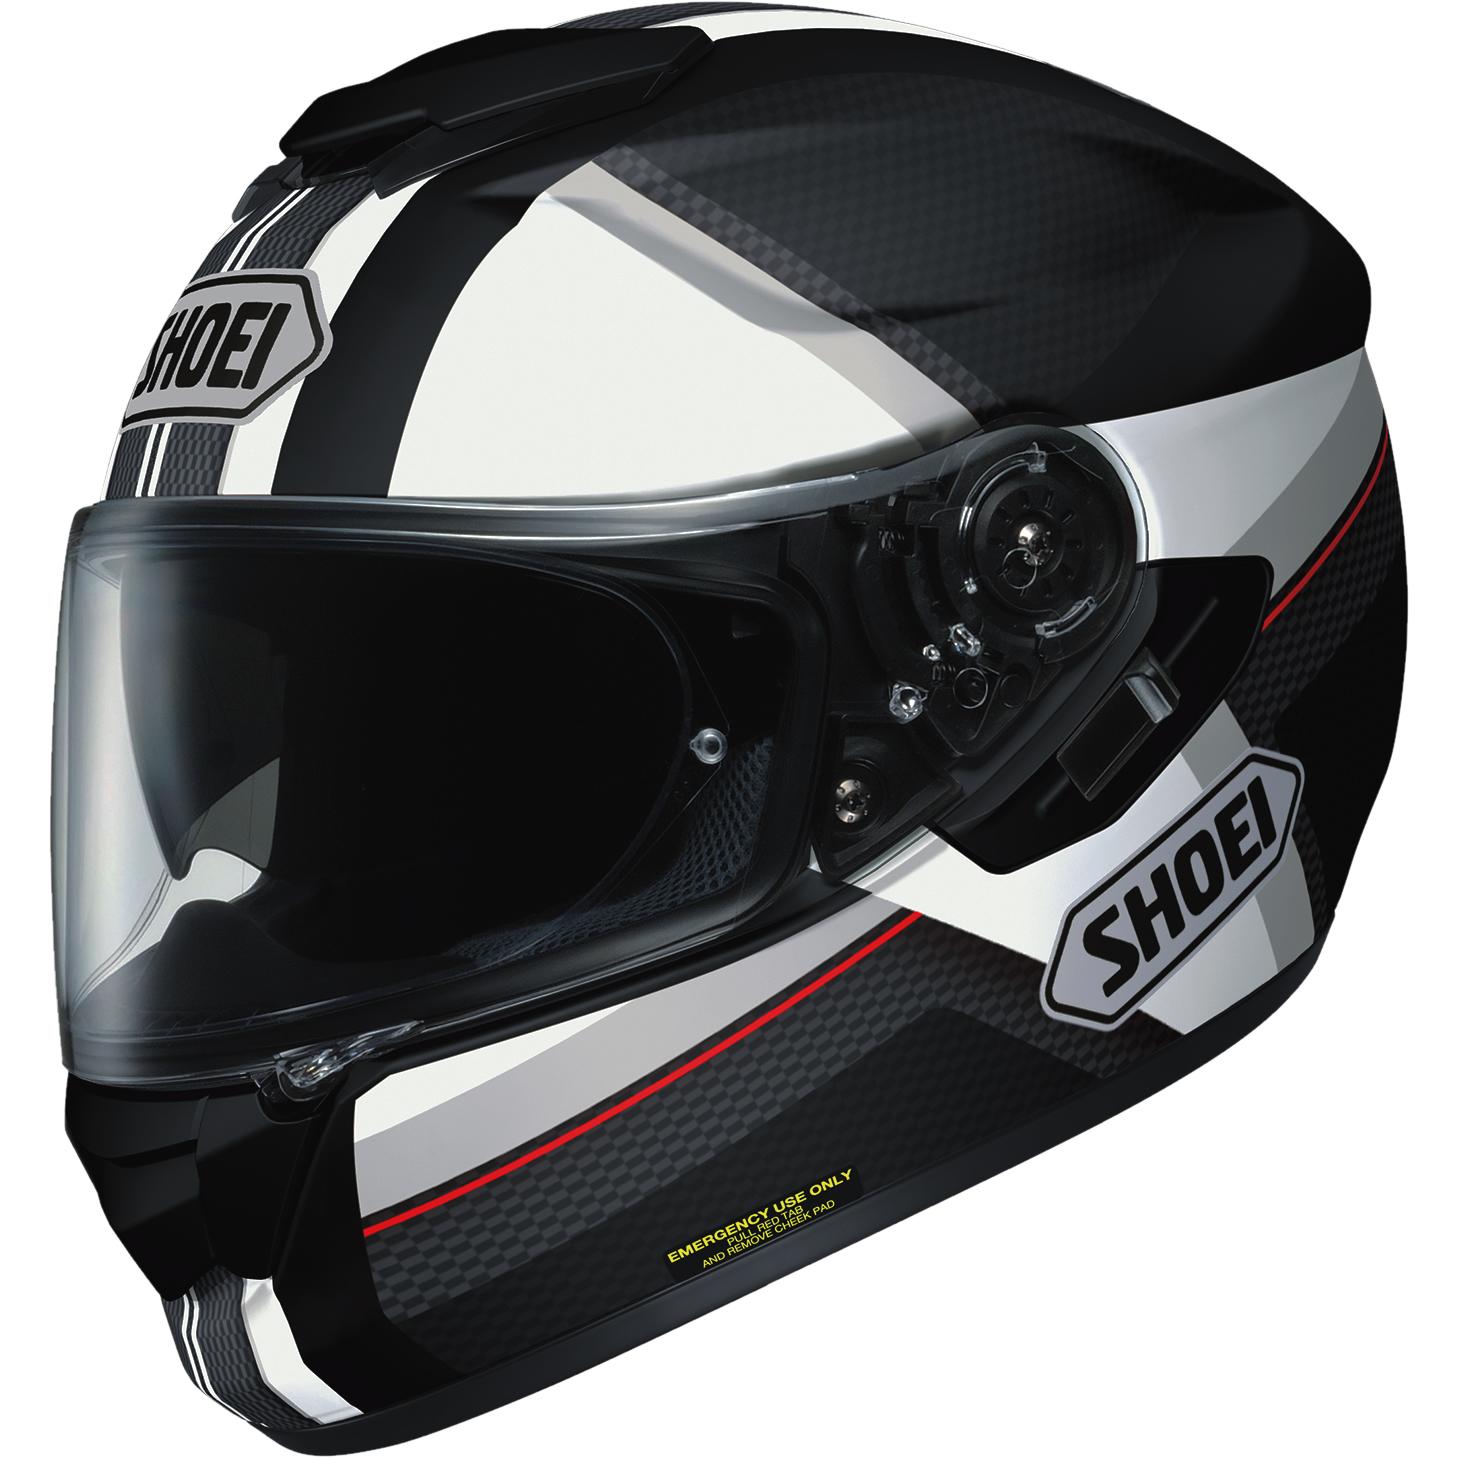 shoei gt air exposure grey motorcycle helmet tc 5 full face agu gold dd ring lid ebay. Black Bedroom Furniture Sets. Home Design Ideas